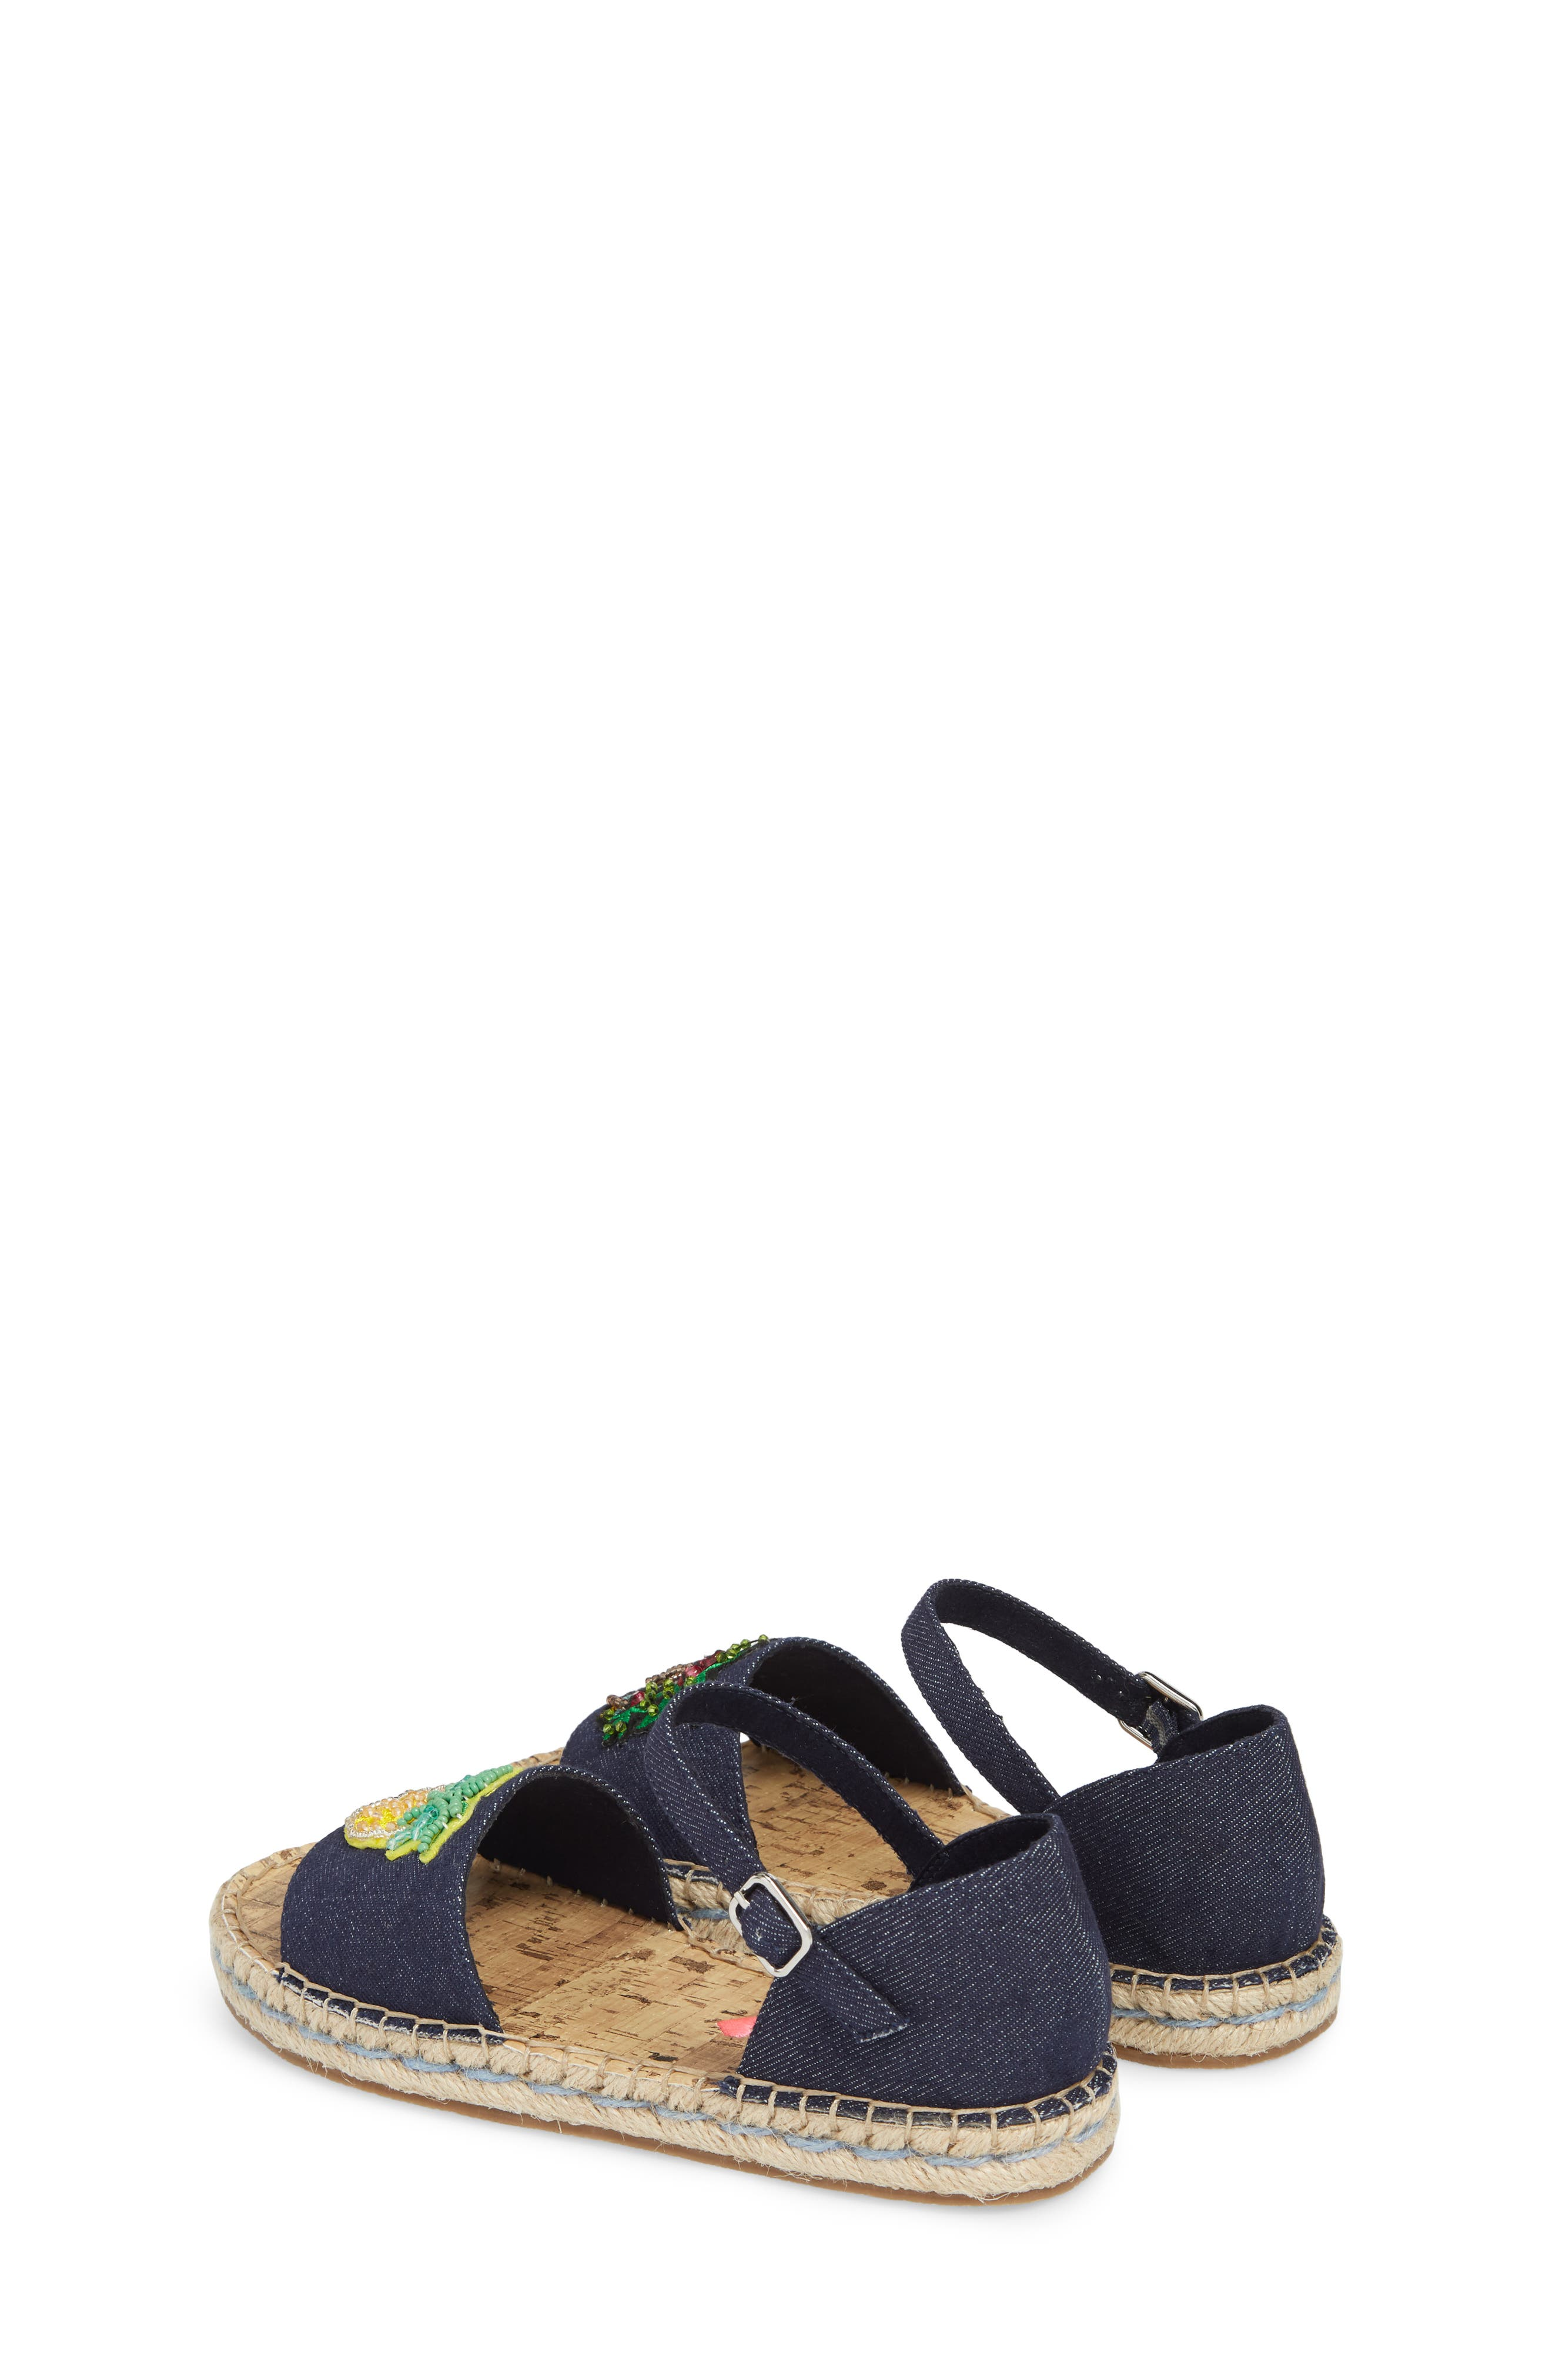 JLUAO Tropical Embellished Sandal,                             Alternate thumbnail 3, color,                             001